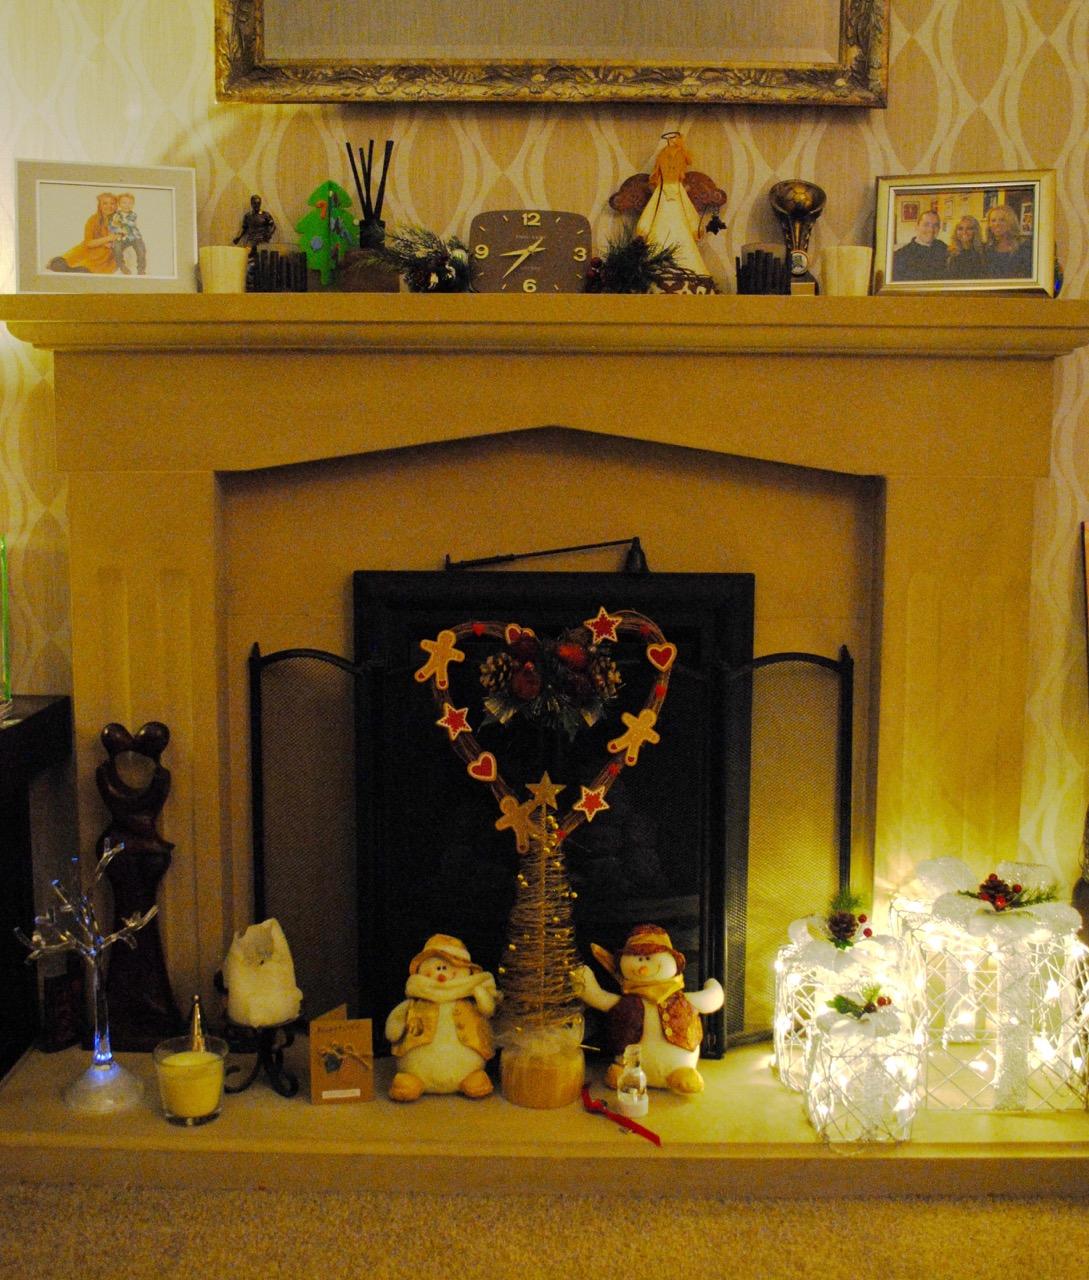 Christmas Decorations At Aldi : Cake junki lighting up christmas with aldi